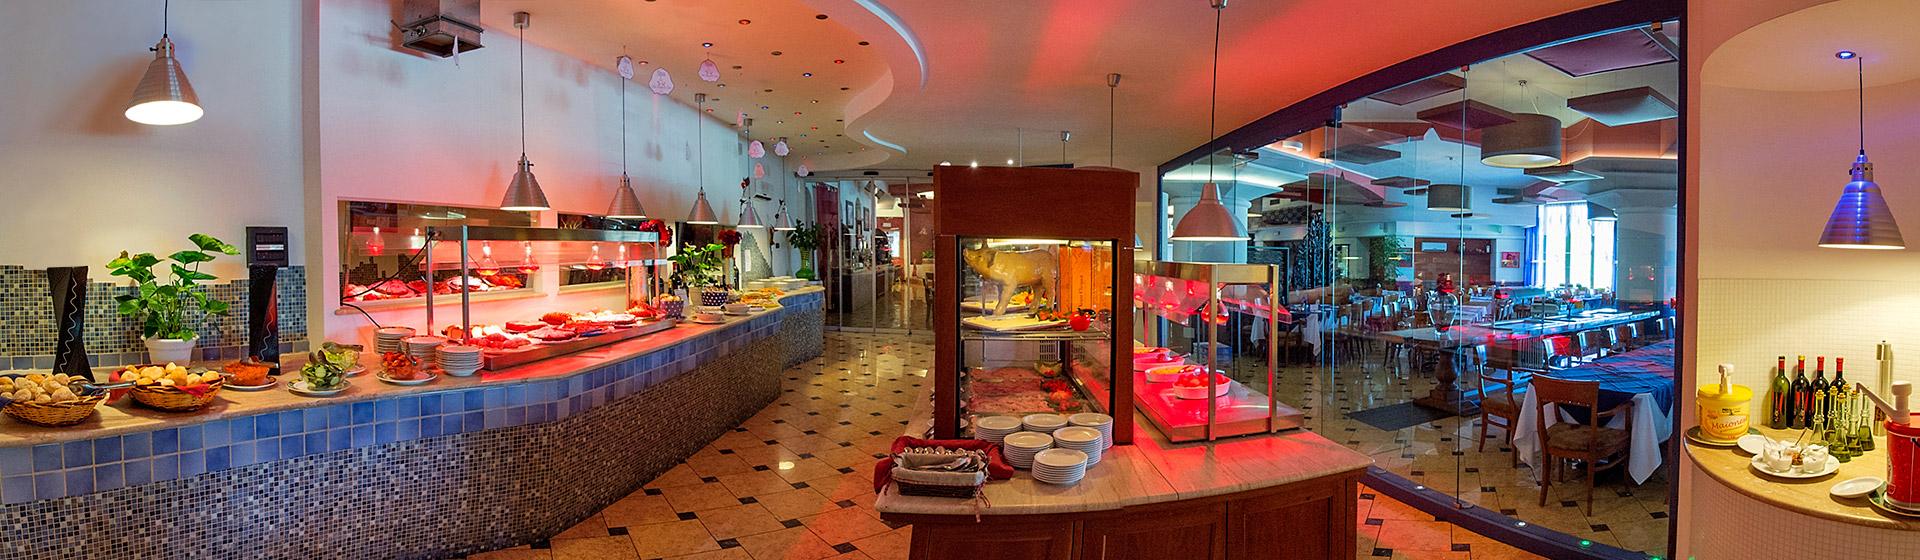 slide_02_ristorante